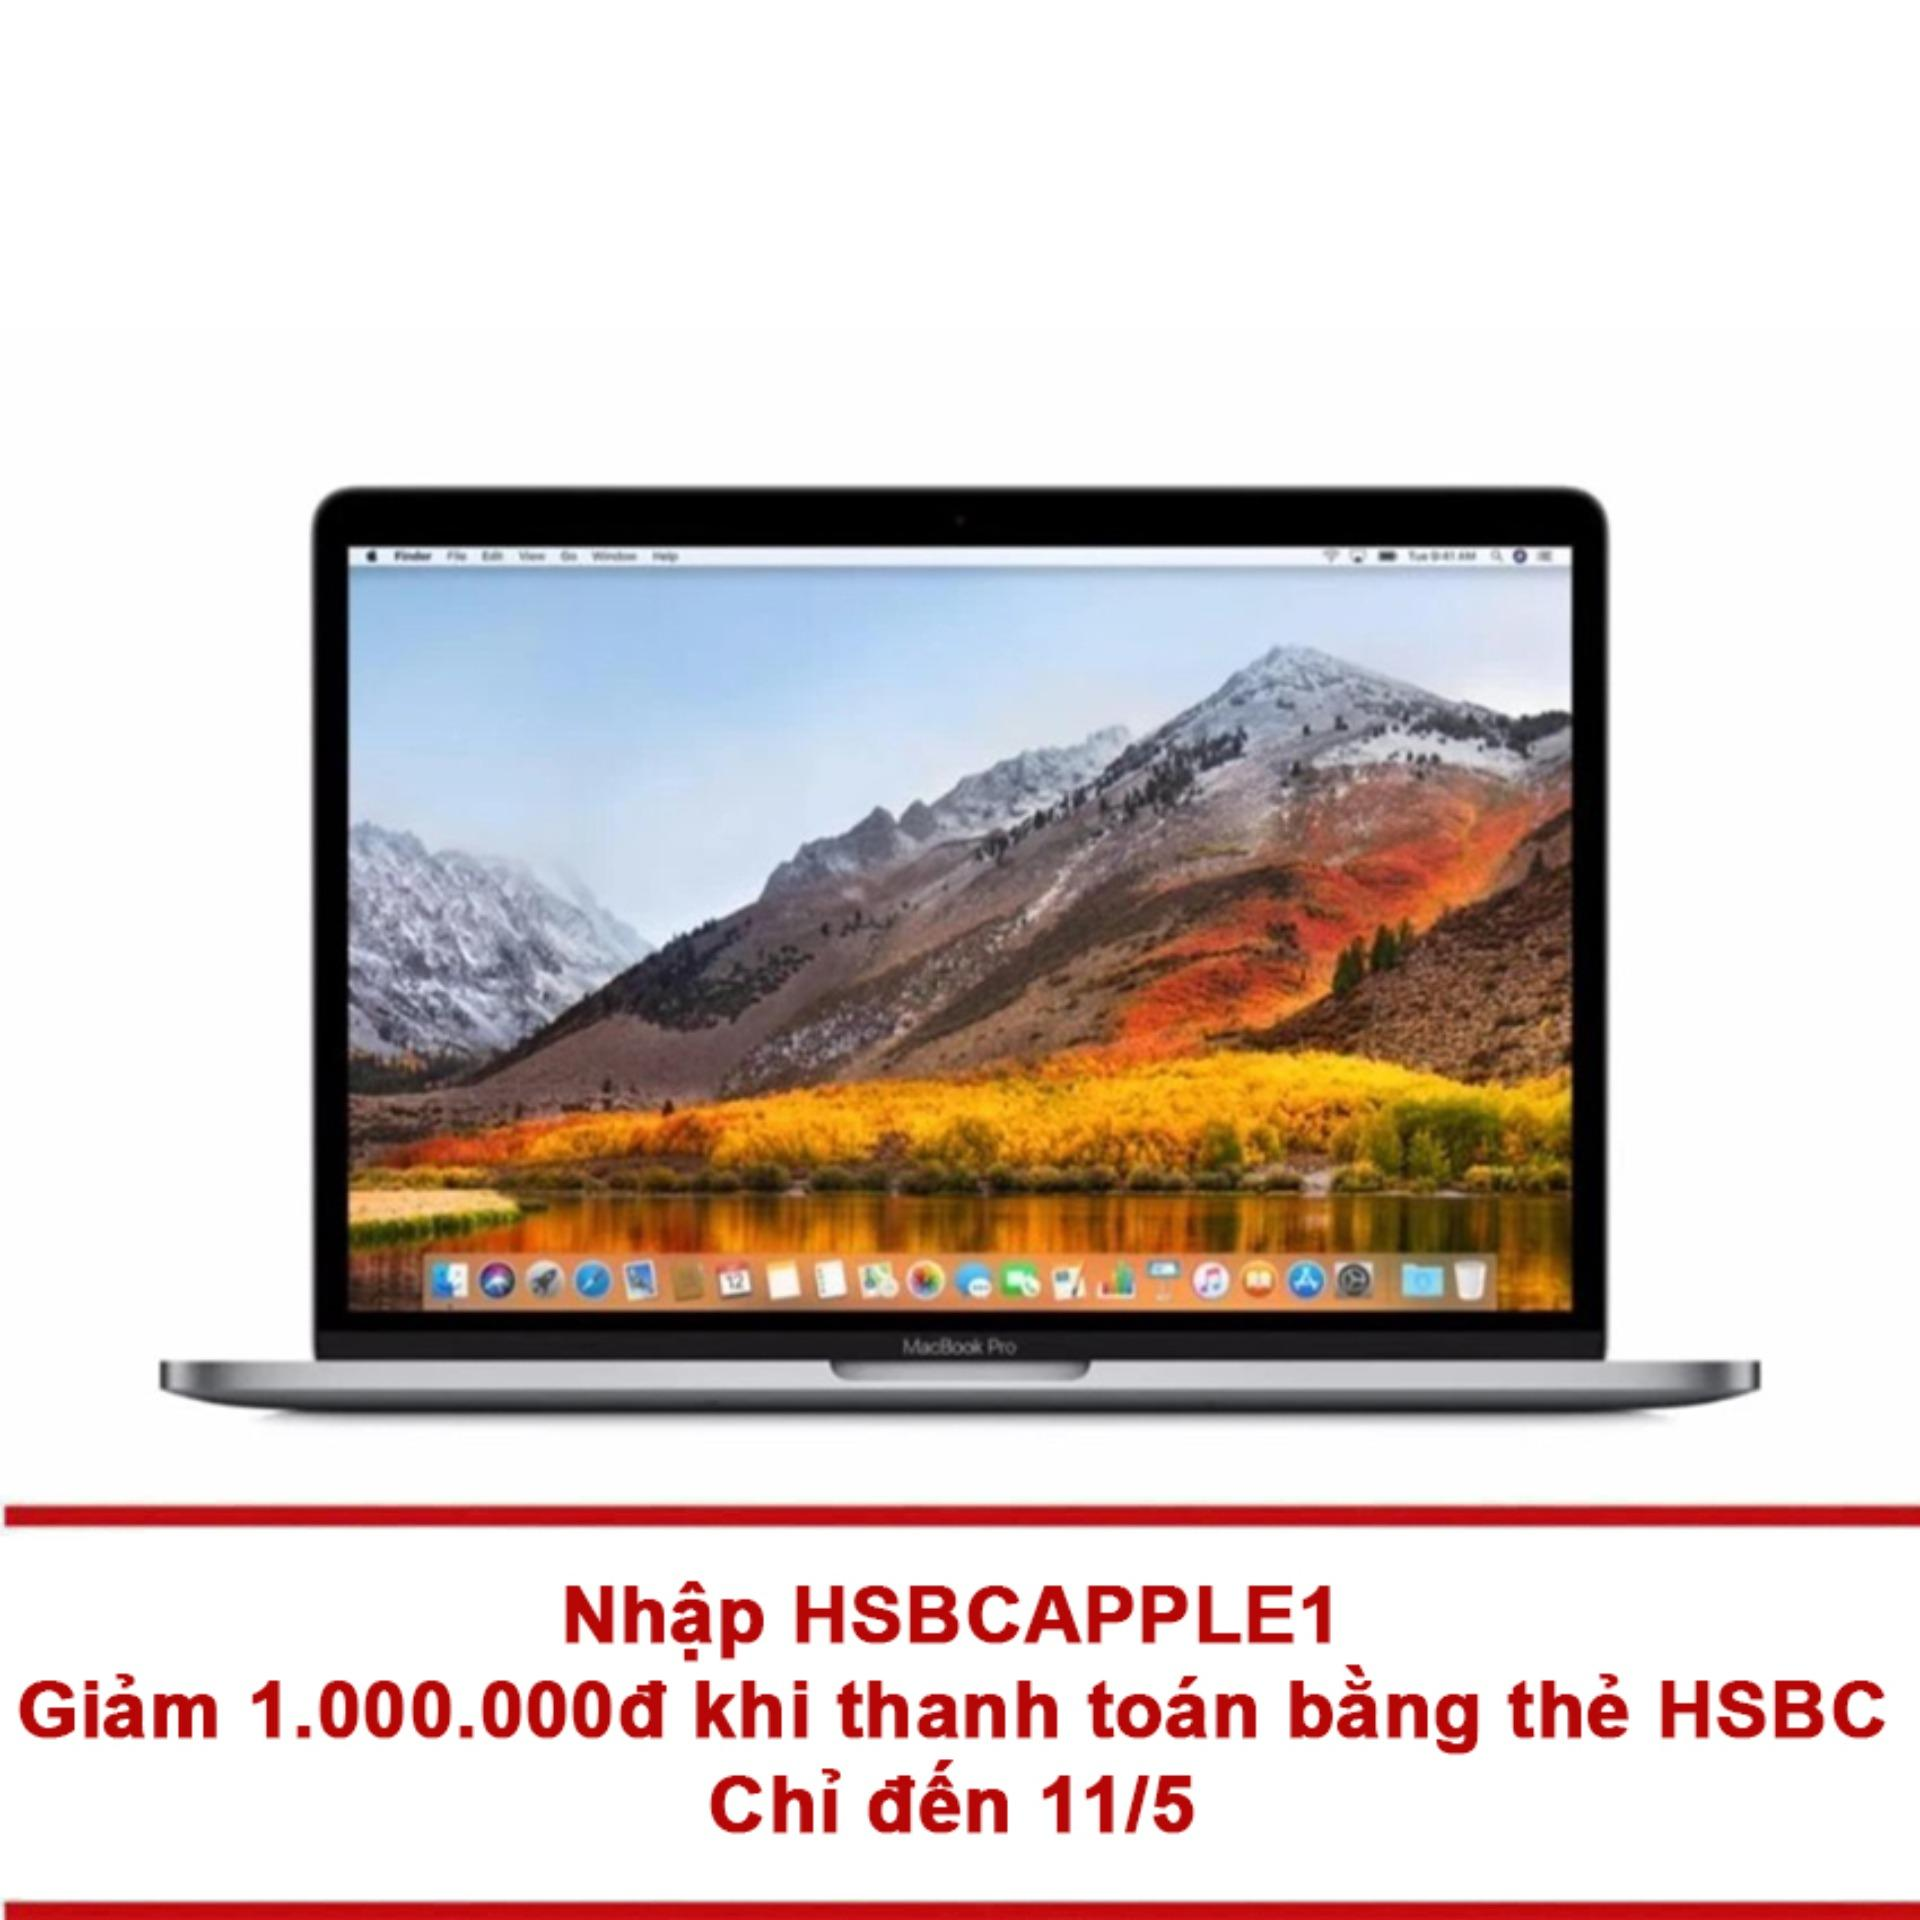 Apple MacBook Pro 13-inch 2.3GHz dual-core i5 128GB Space Grey